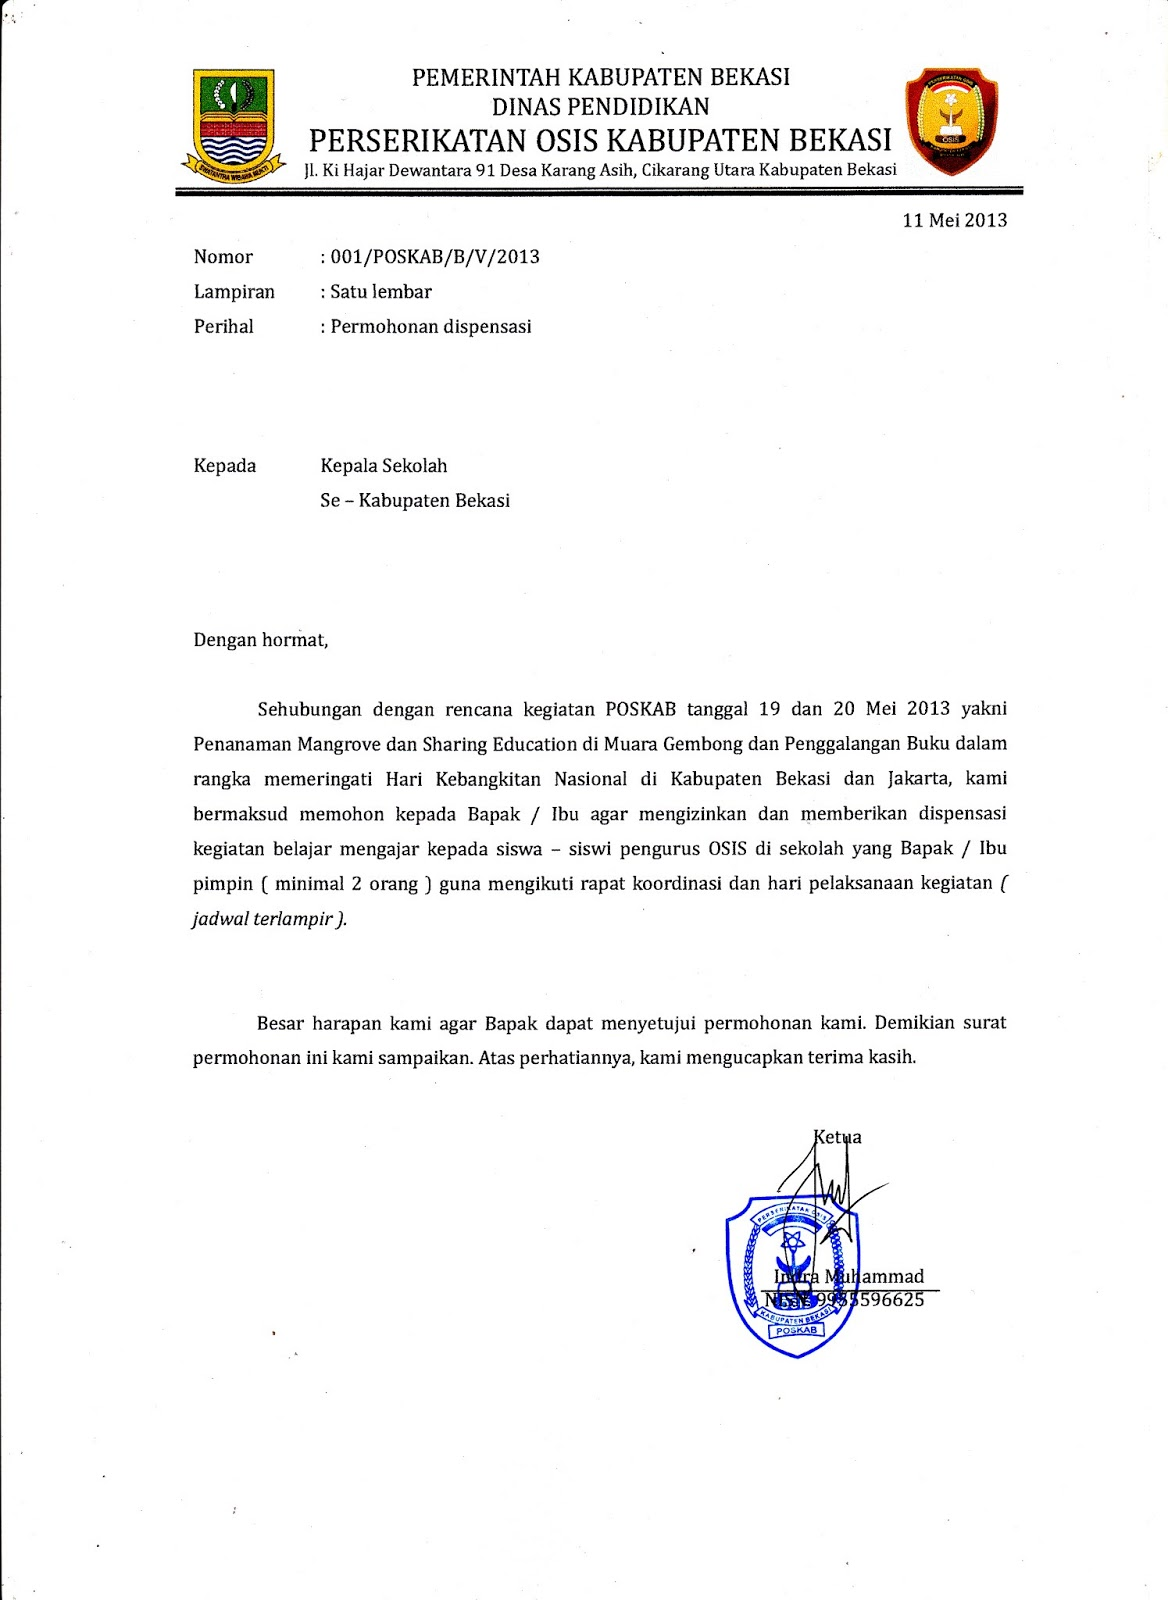 Contoh Surat Dispensasi Sekolah